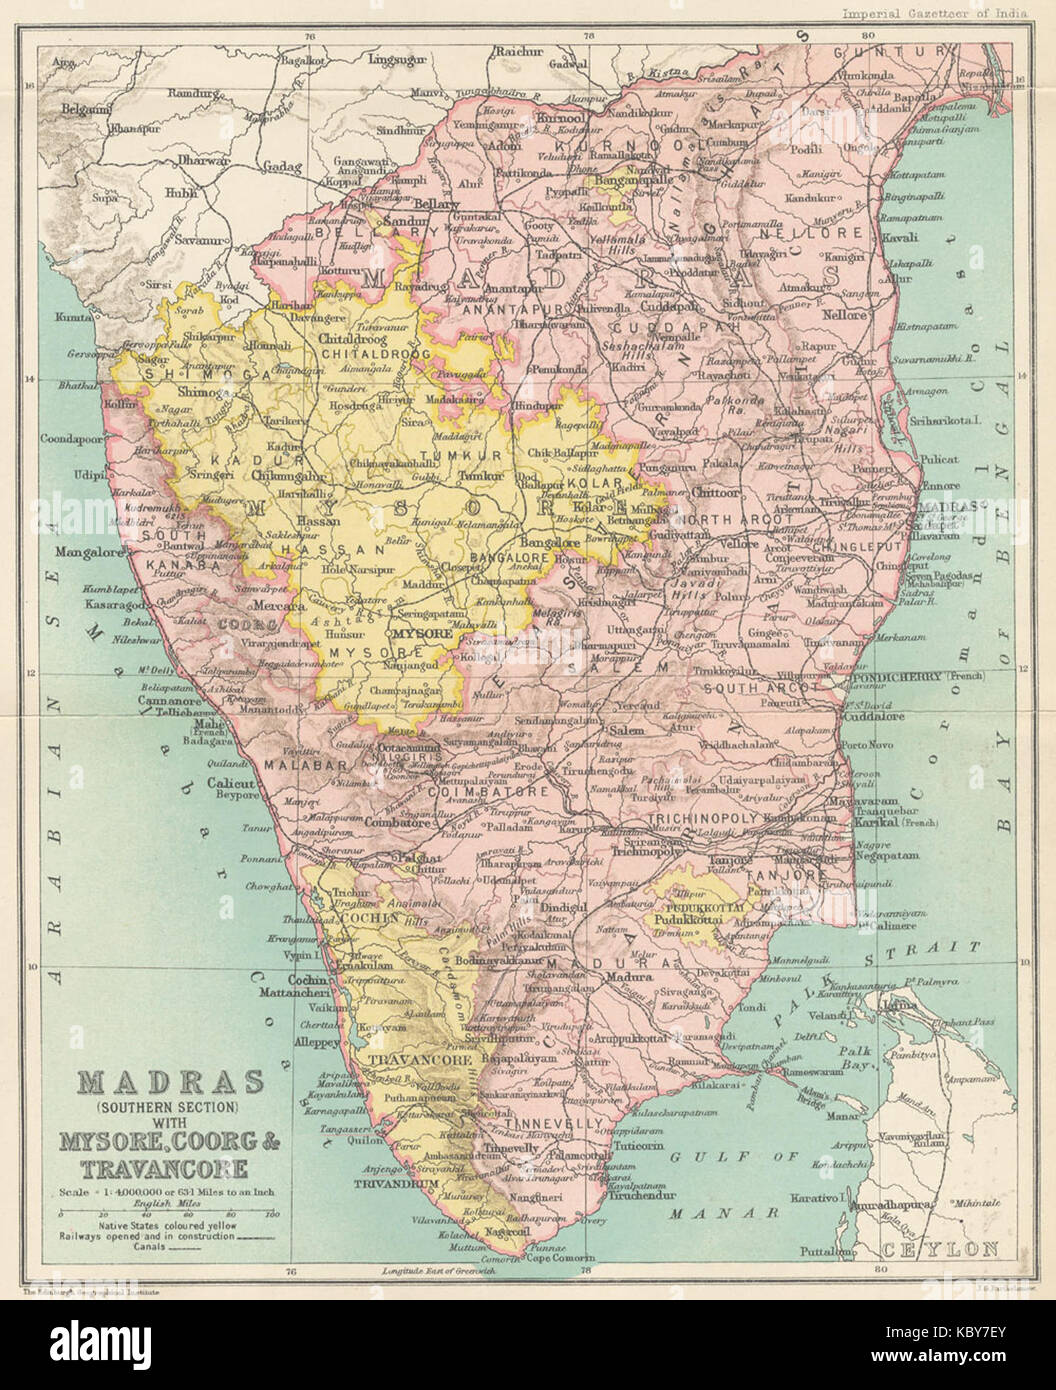 Mysore Map Stock Photos & Mysore Map Stock Images - Alamy on delhi map, mangalore map, karnataka map, biratnagar map, munnar map, dhar city map, anjuna beach map, bombay map, madras map, agumbe map, bengal map, hyderabad map, satpura map, bangalore map, kerala map, kashmir map, india map, tamil nadu map, chennai international airport map, calcutta world map,